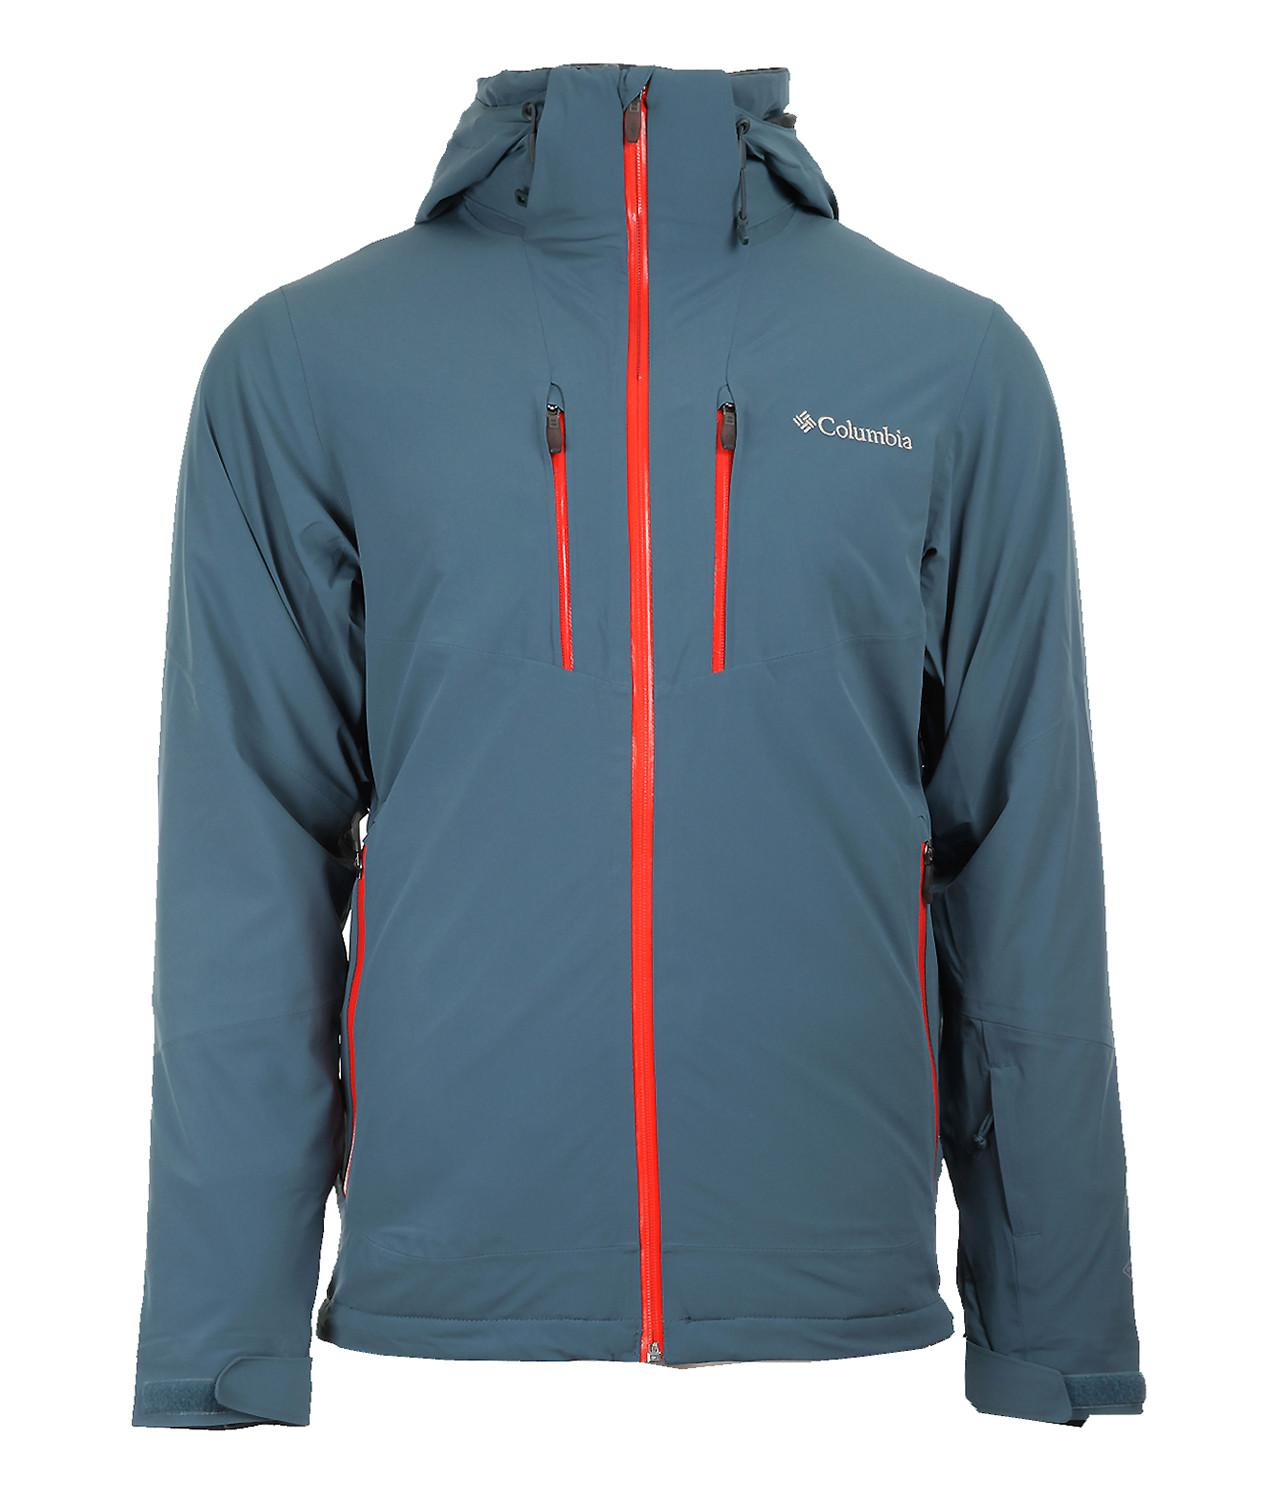 4534de5c73c Lyst - Columbia Millennium Blur Jacket in Blue for Men